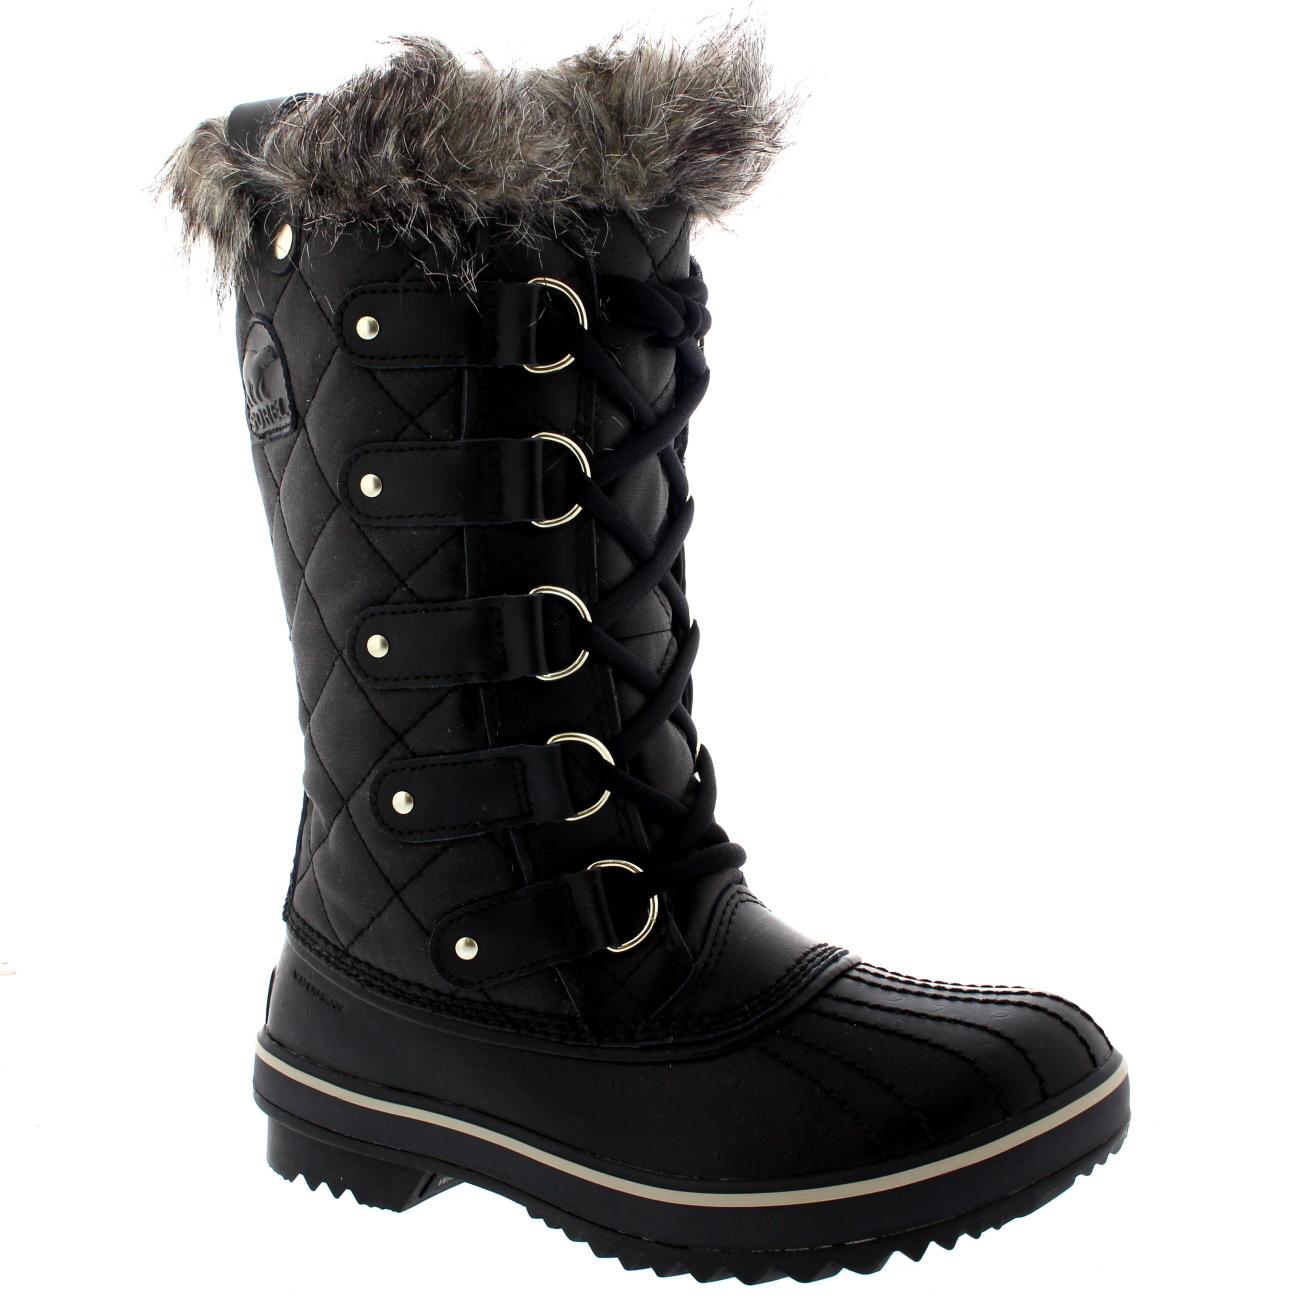 Sorel Tofino Leather